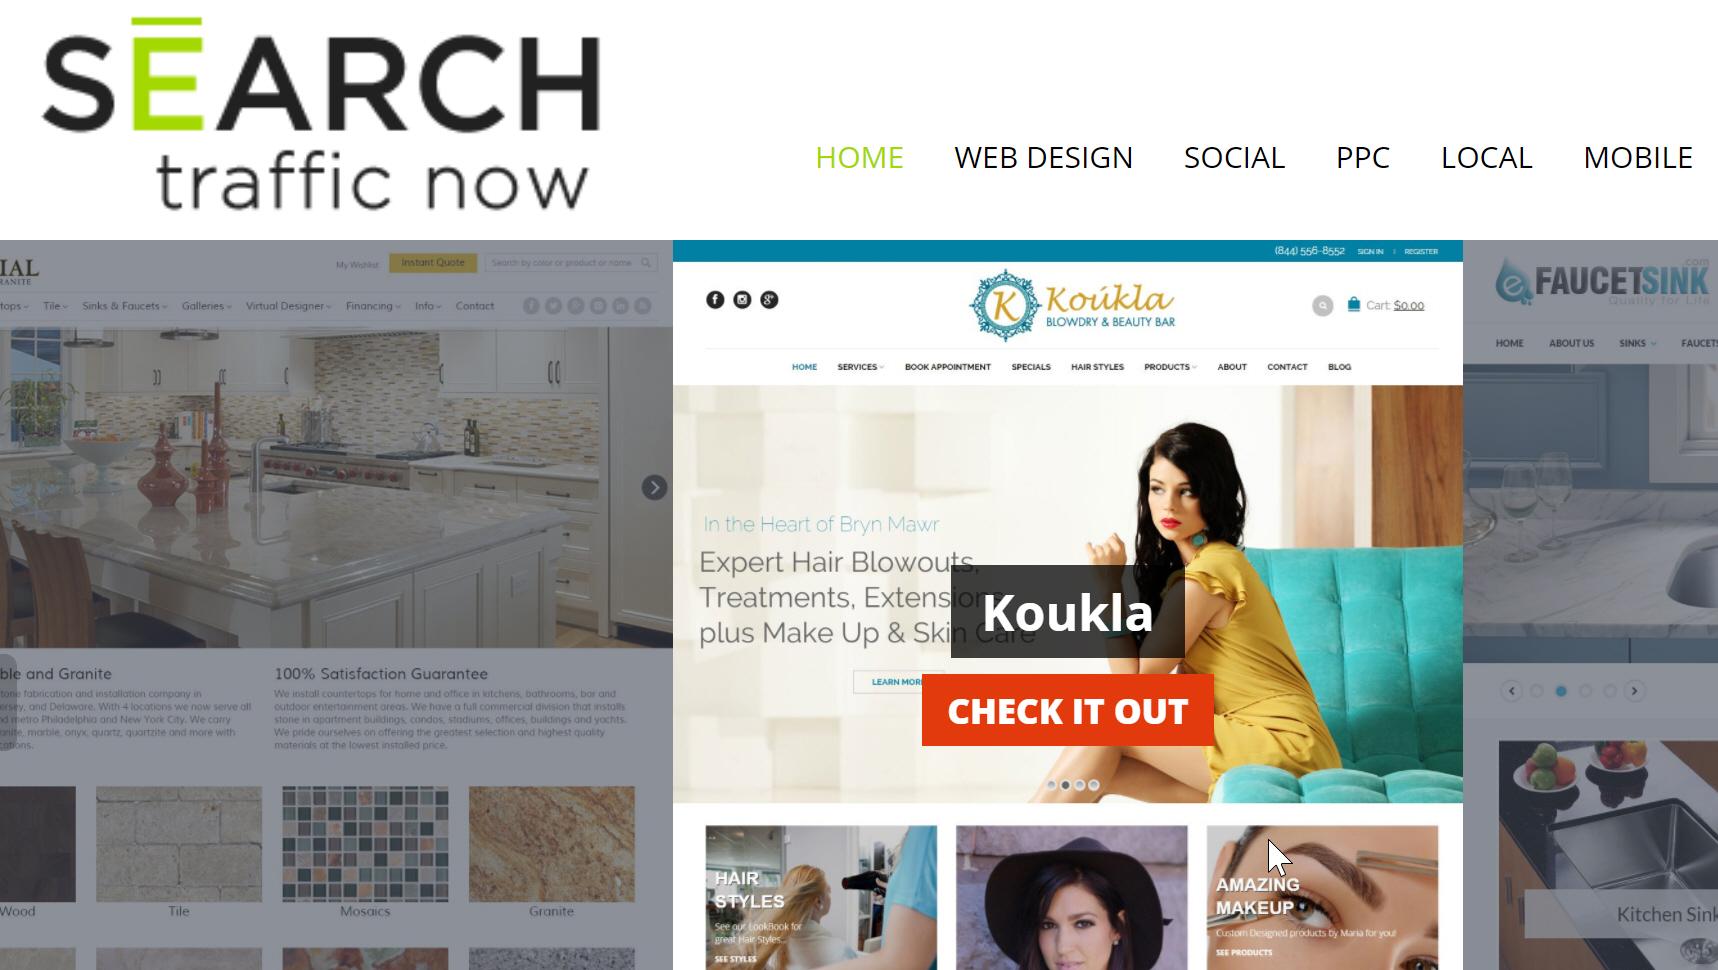 Web Design, Internet Marketing, Google Adwords, Local Optimization plus